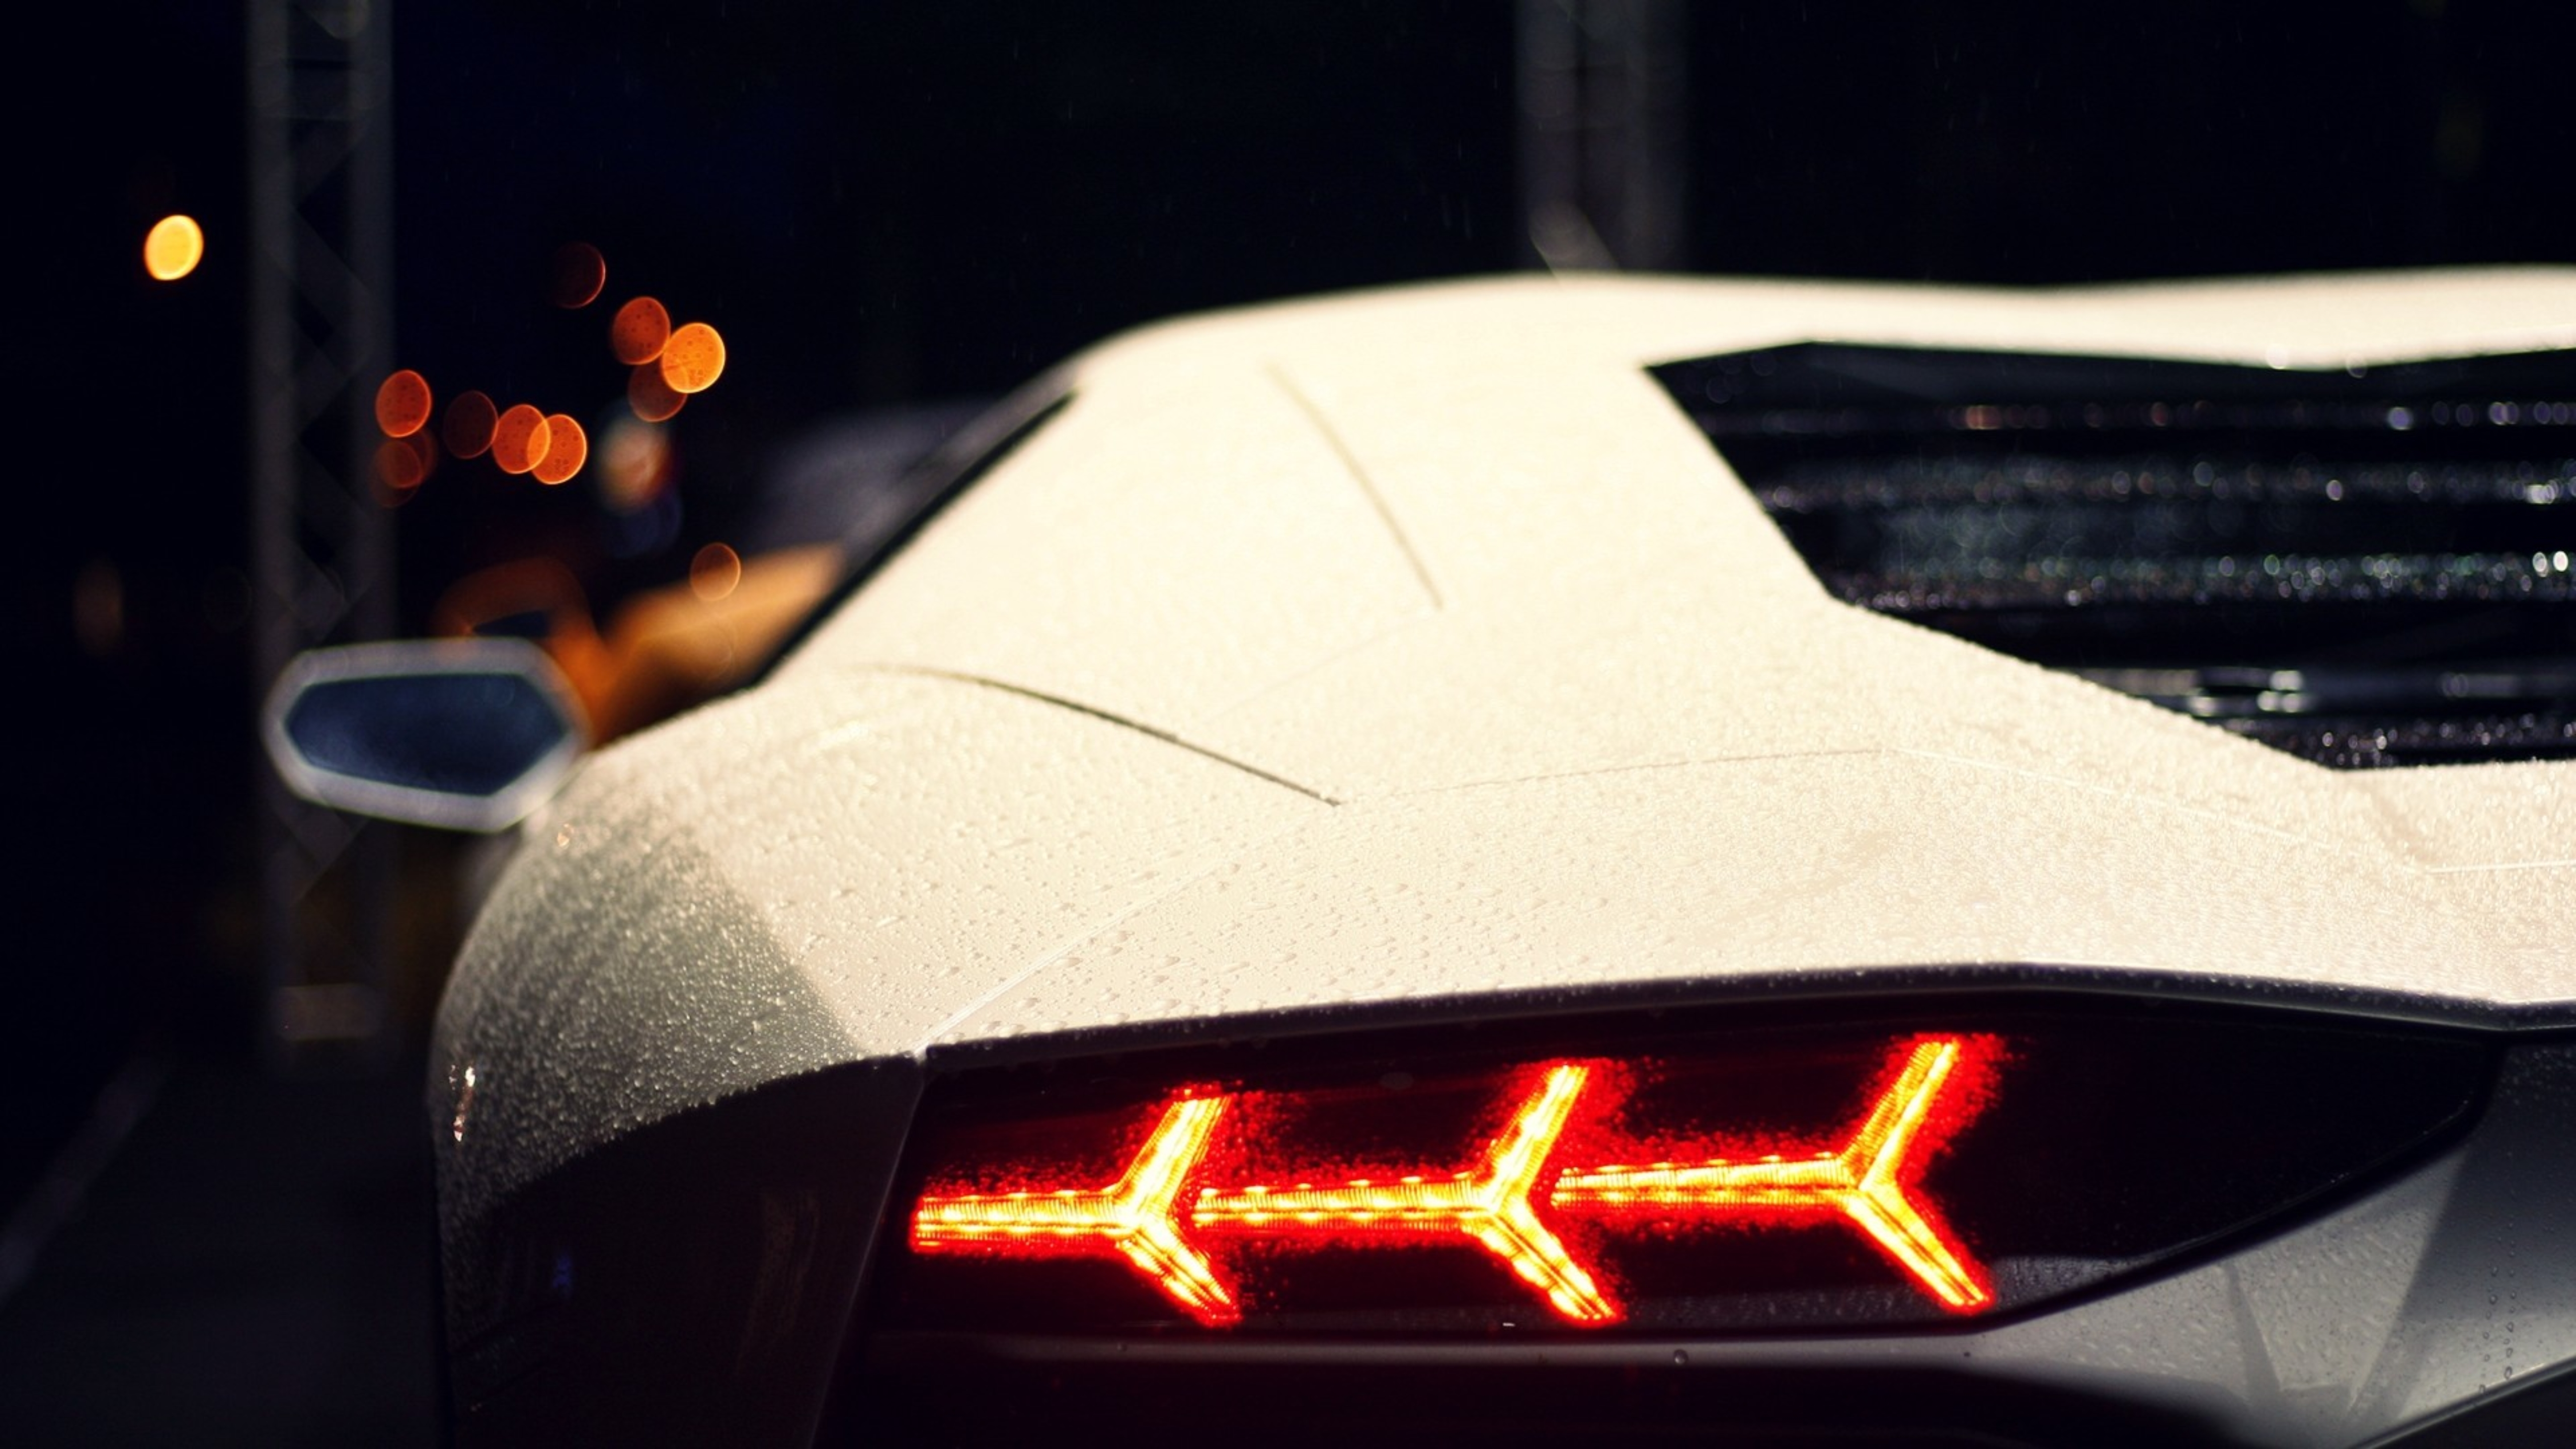 White Lamborghini Aventador Rear